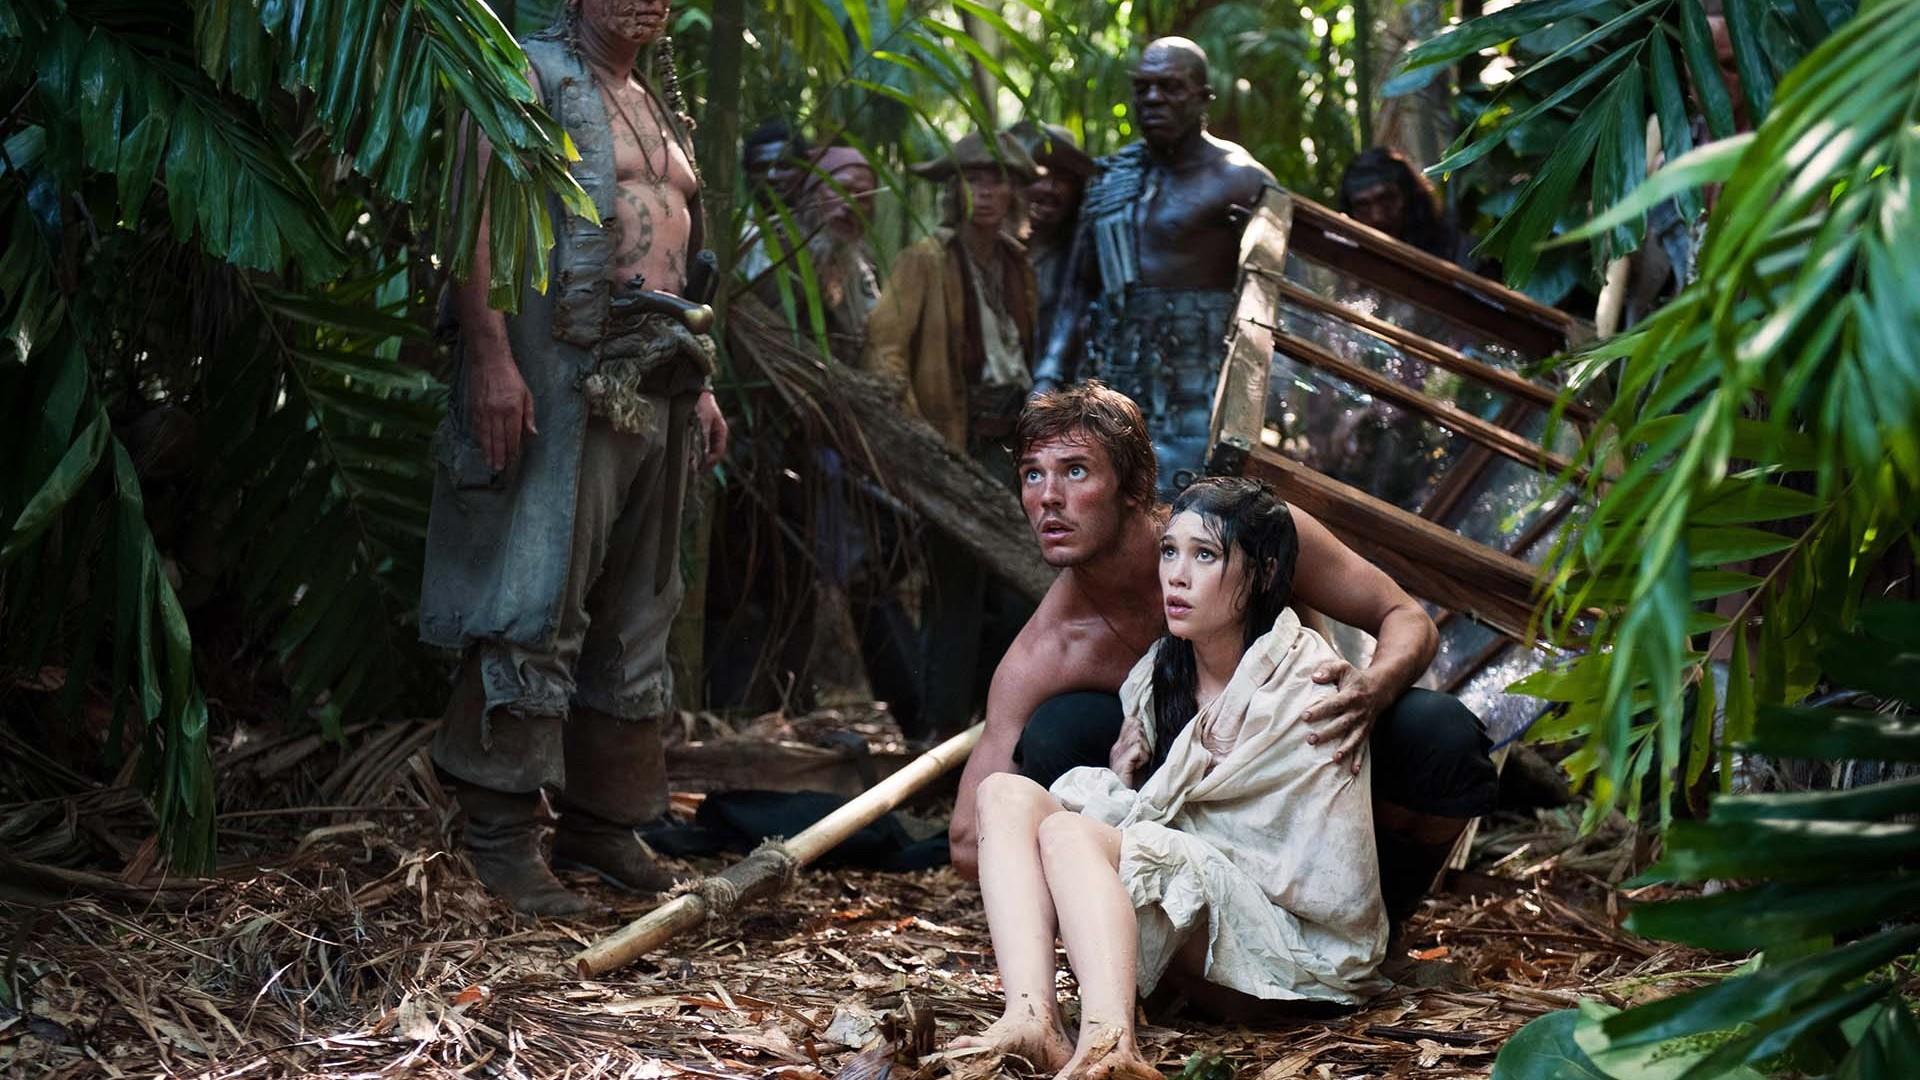 Sam Claflin Pirates of the Caribbean: On Stranger Tides